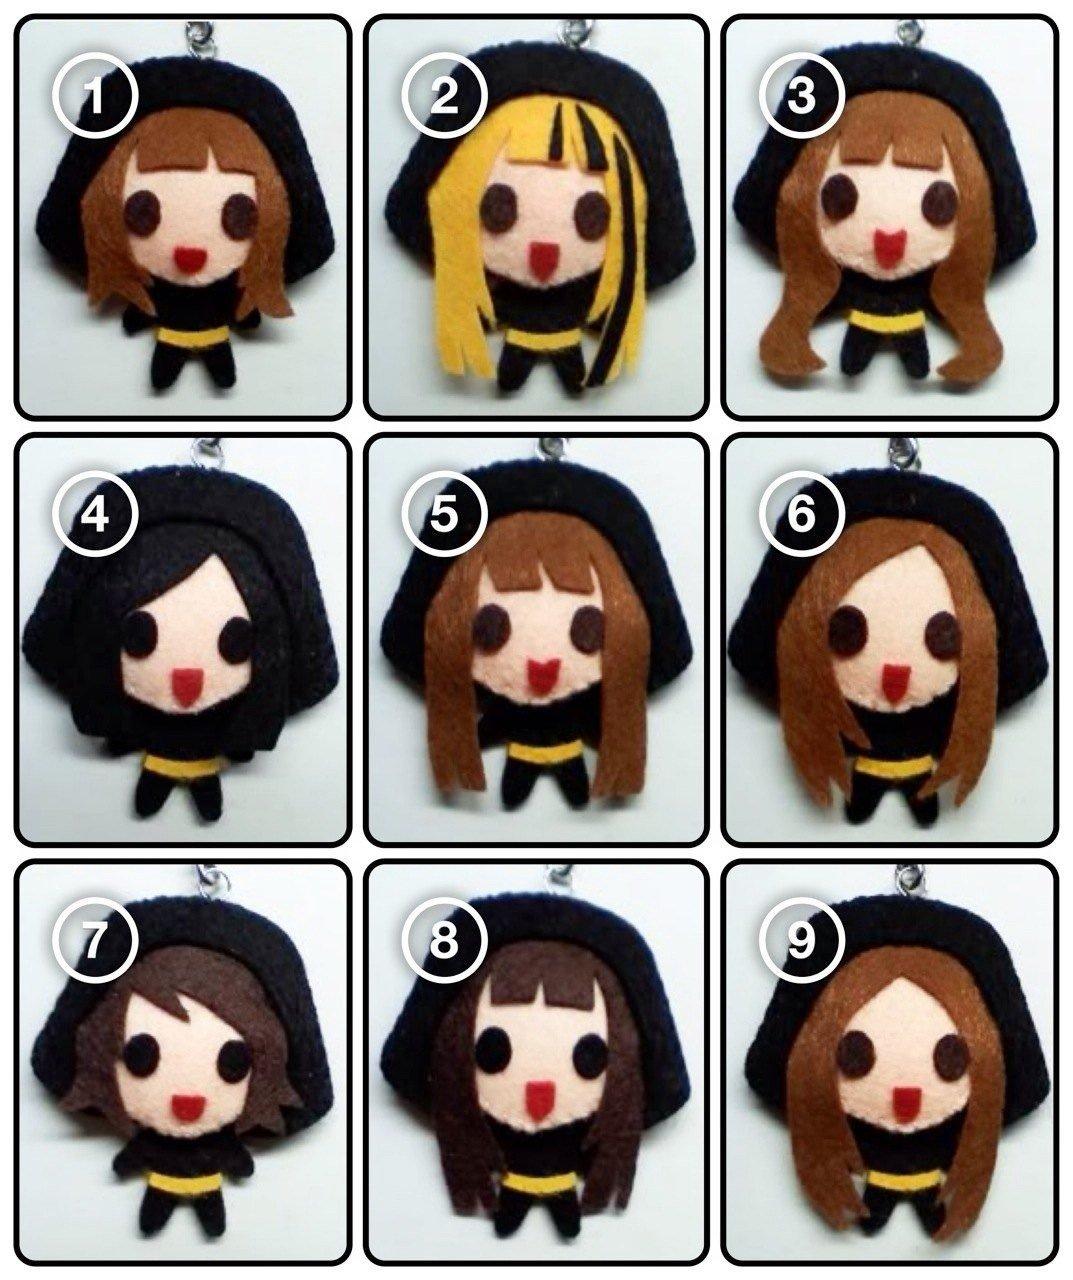 [SET of 9] SNSD - Run Devil Run KPOP Handmade Doll Keychains